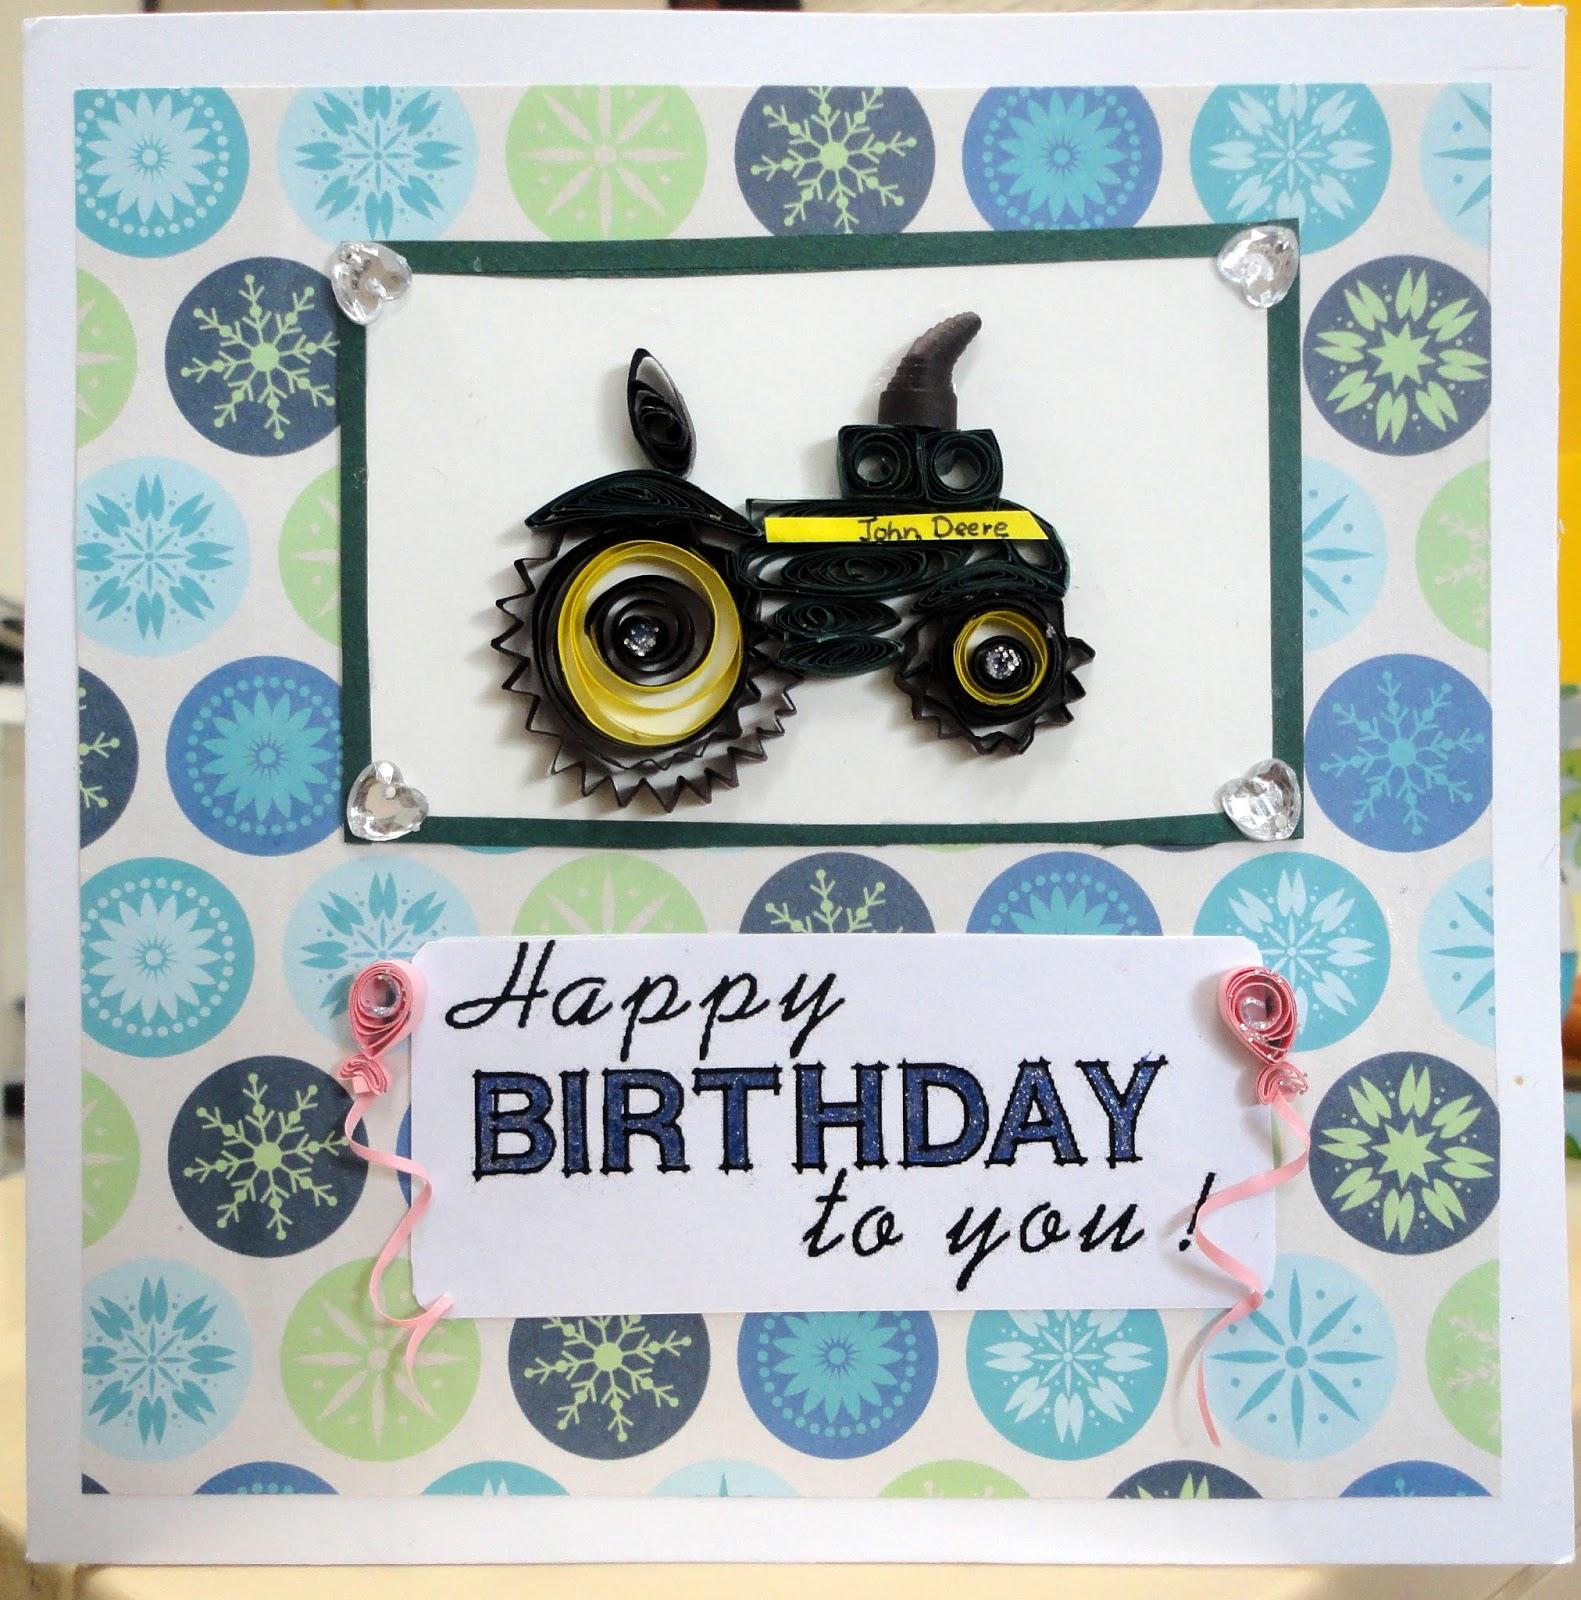 Adhiraacreations Birthday Card – Tractor Birthday Cards